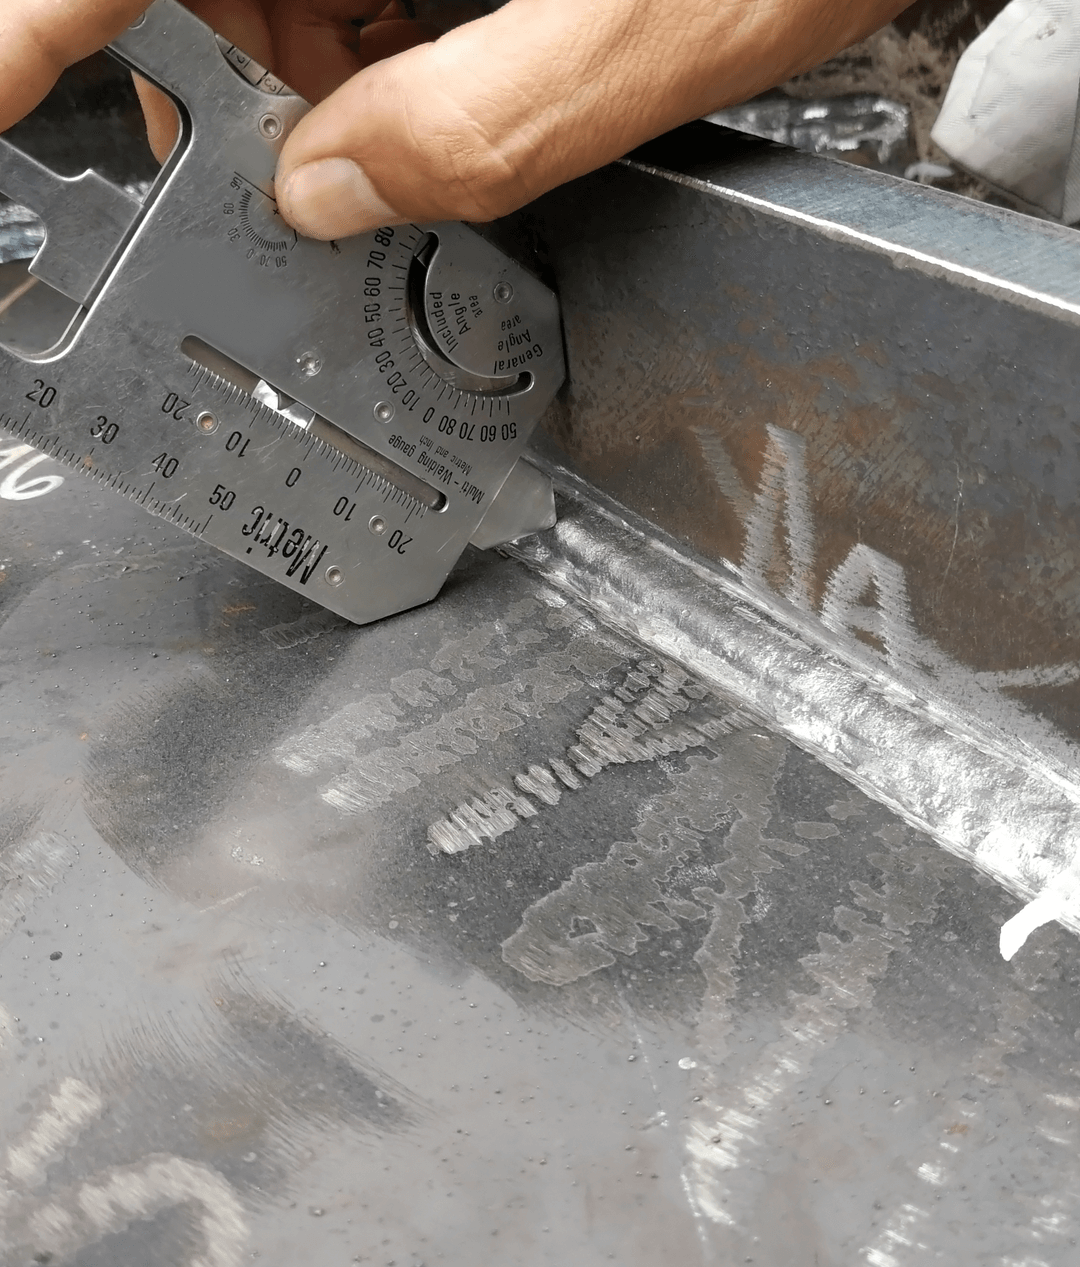 welding standards public safety quality welding Technoweld Welding Standards